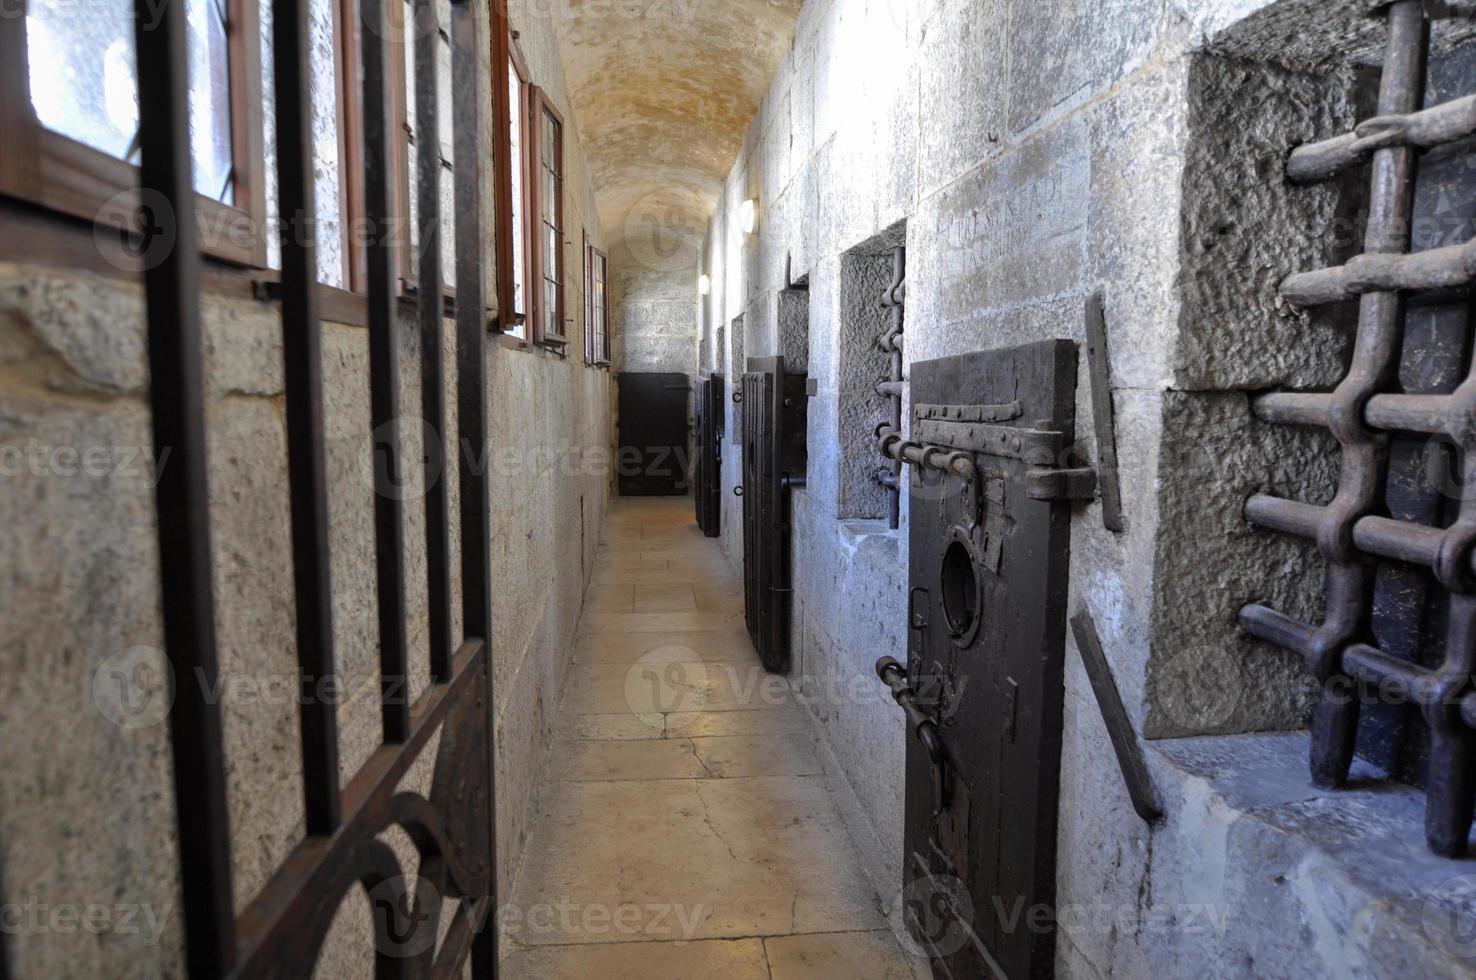 Venise - presion médiévale porte verrouillée photo